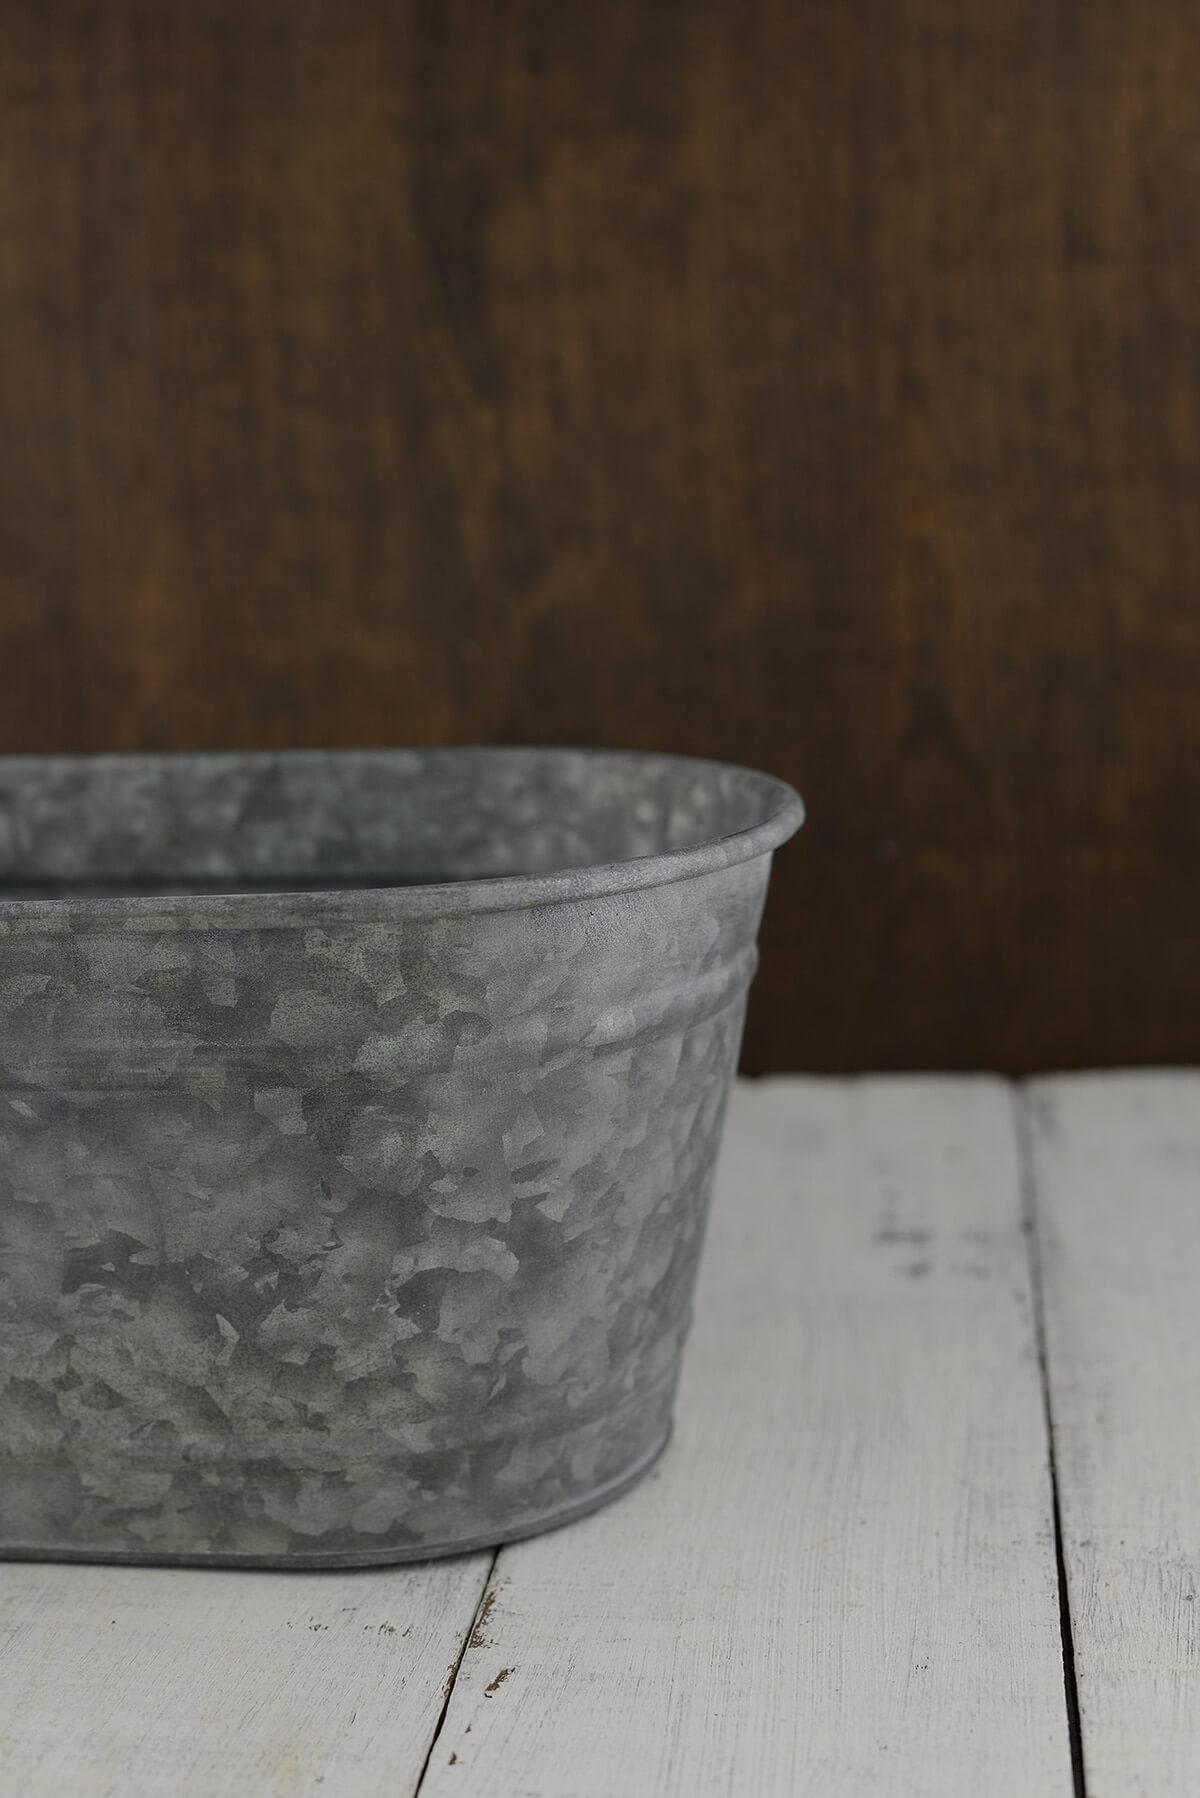 Galvanized Bucket Oval 12 5in